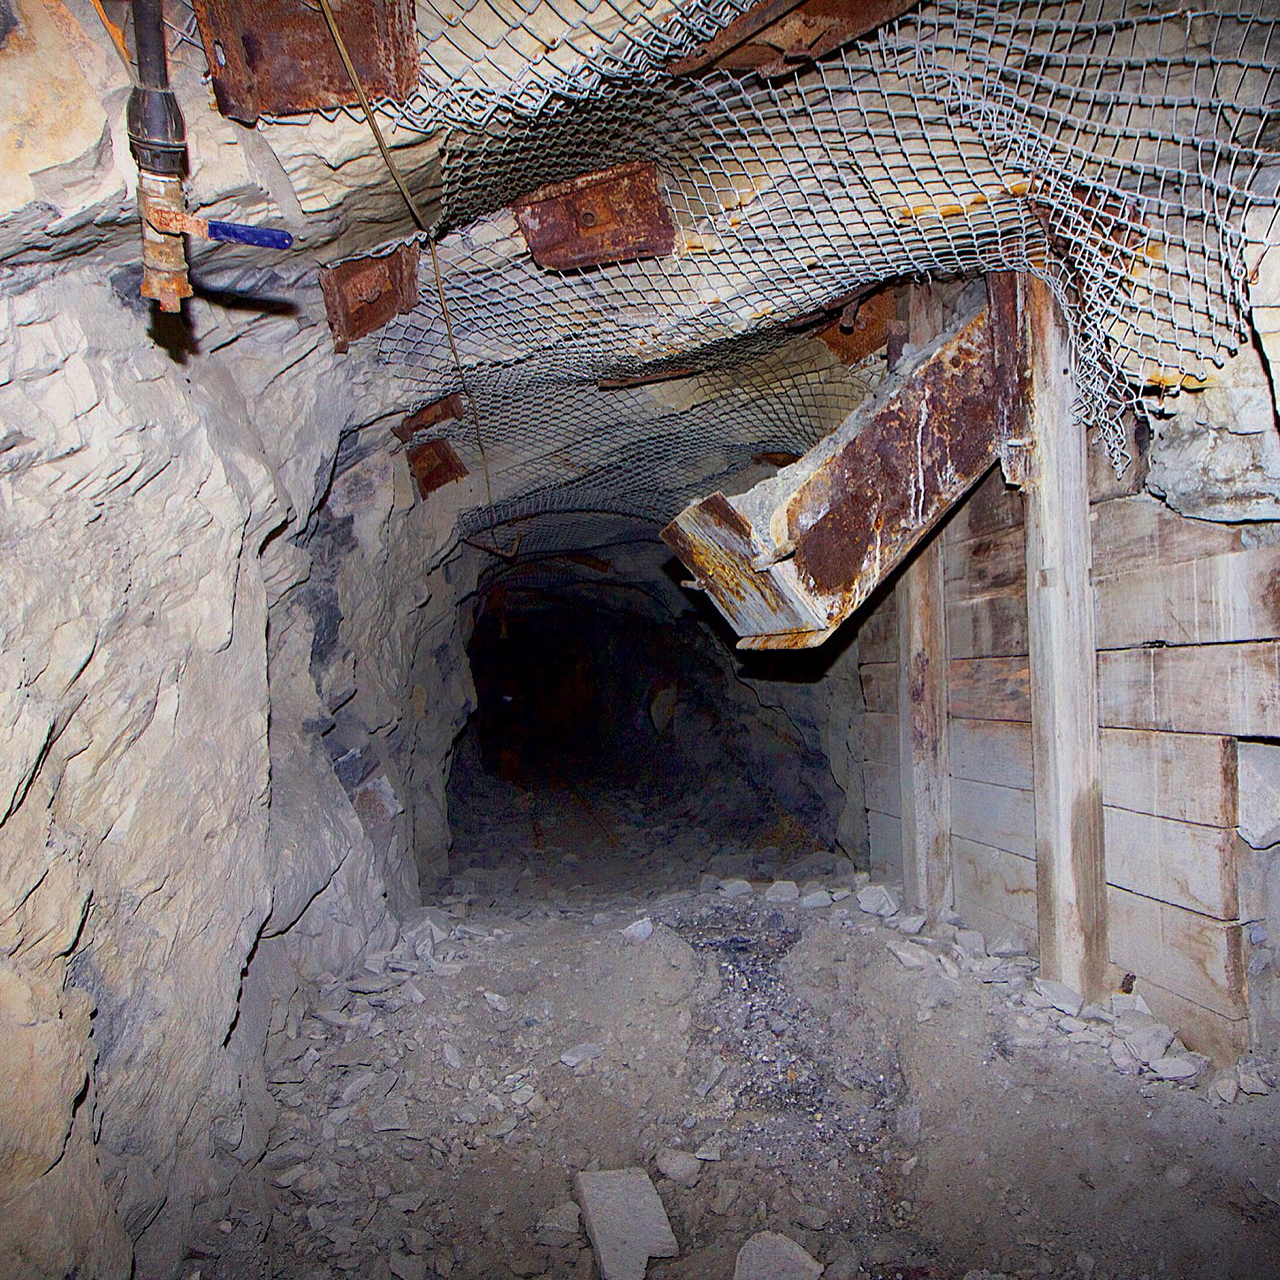 Central Deborah Gold Mine #Bendigo #disused #abandoned #underground